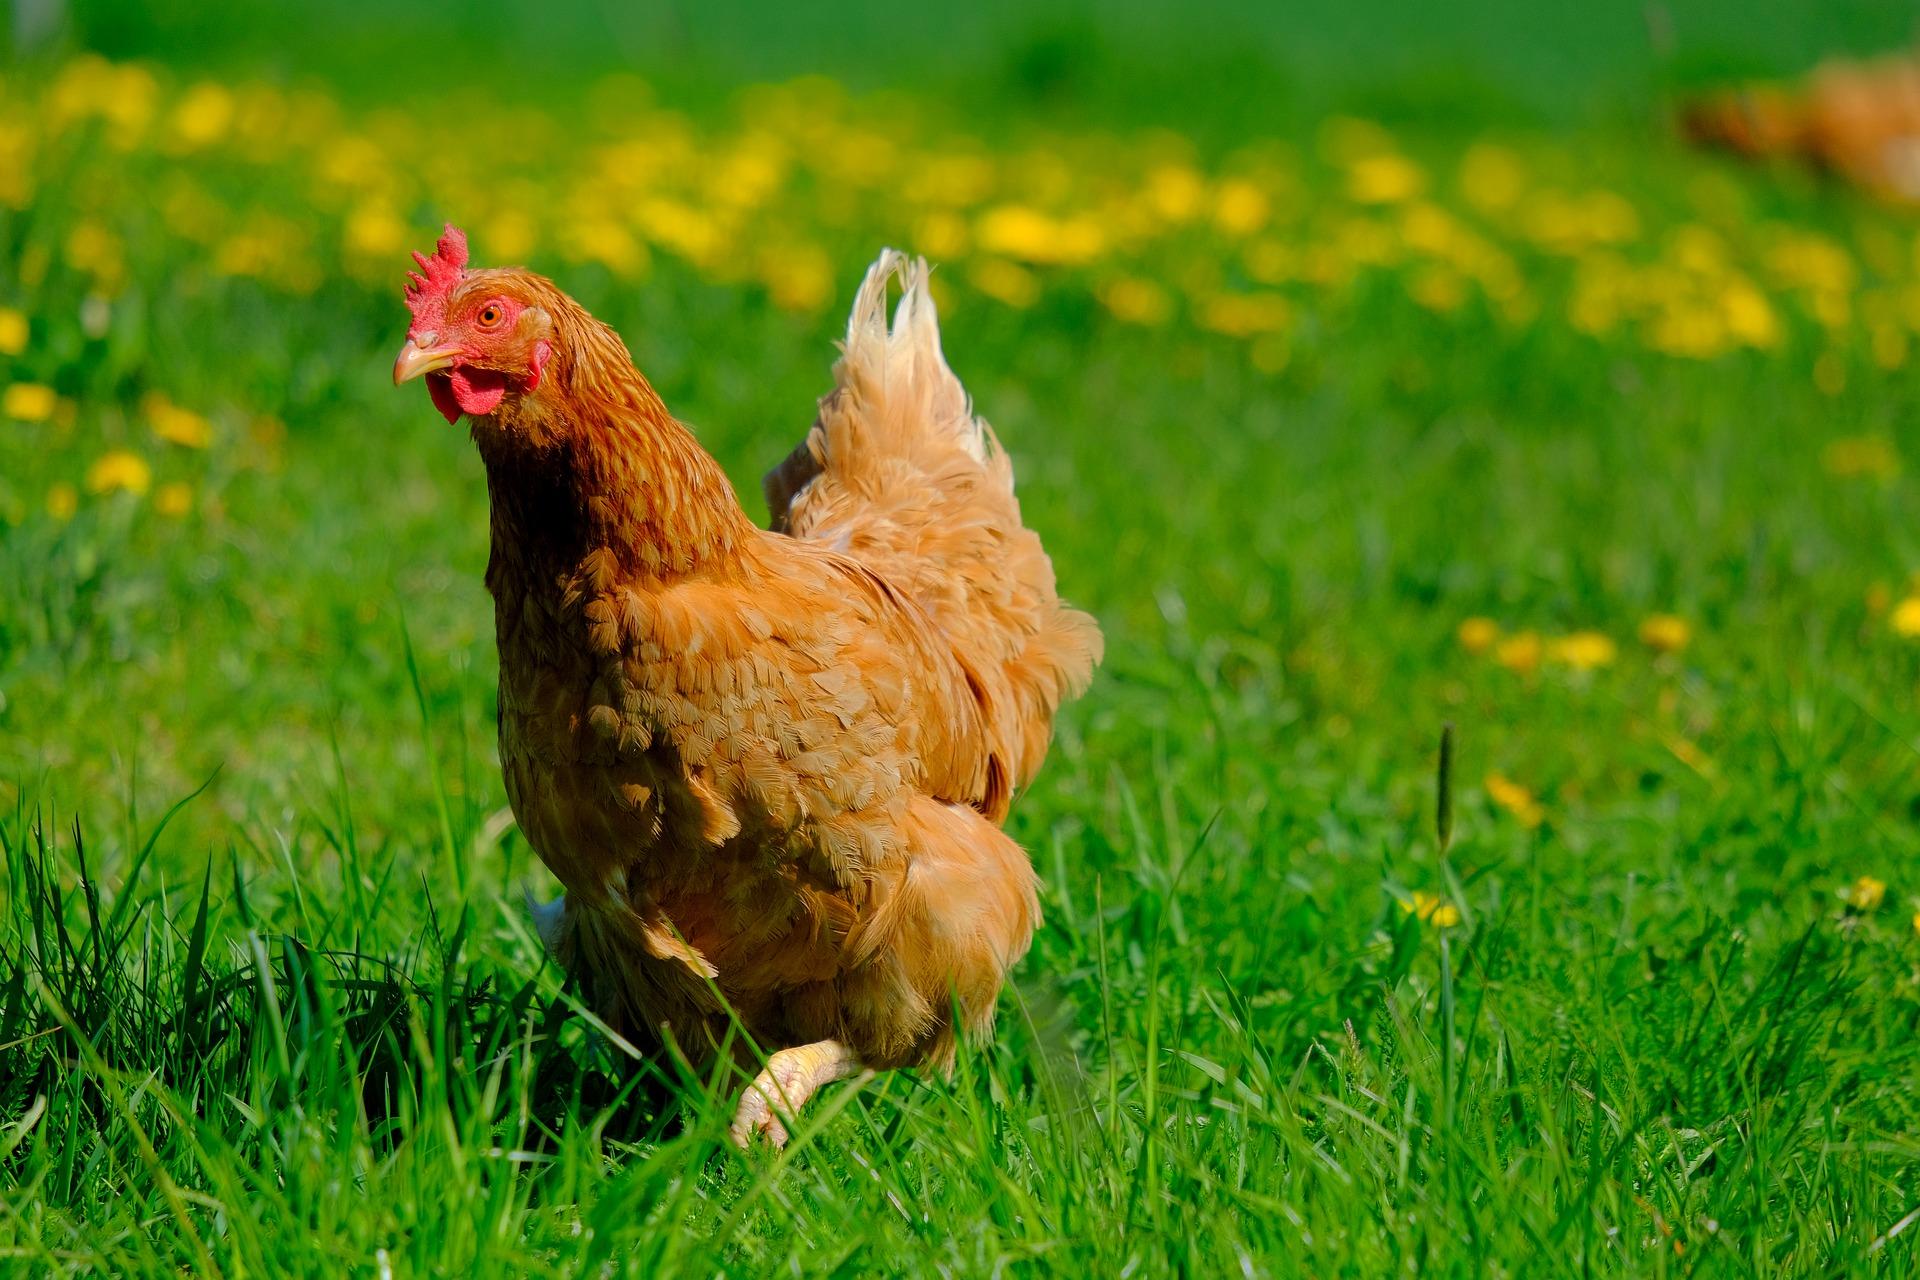 Enrichment for chickens, chicken enrichment, enrichment for chicken coops